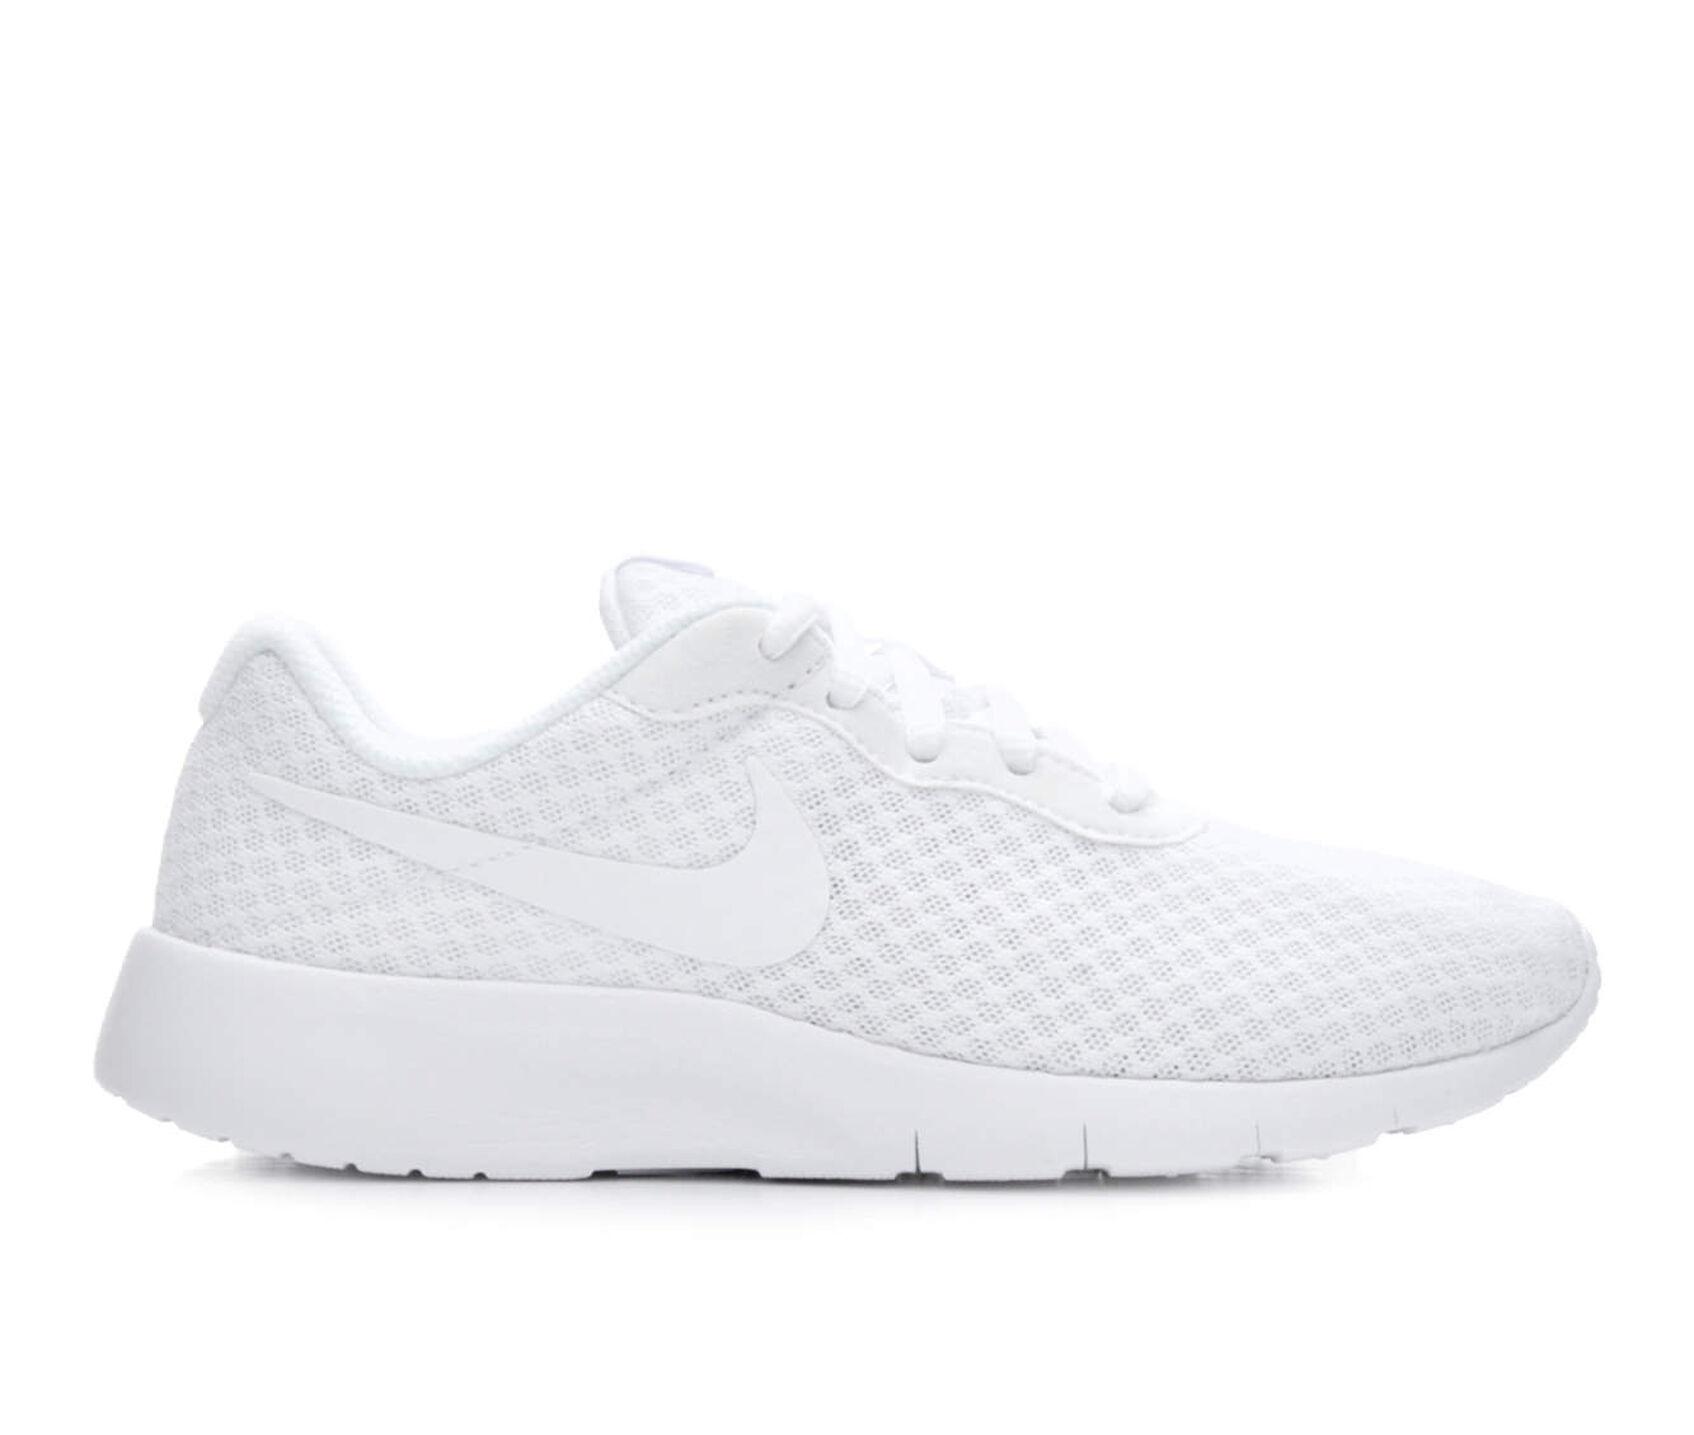 chaussures de sport 6f7b6 a97bd Girls' Nike Little Kid Tanjun Sneakers